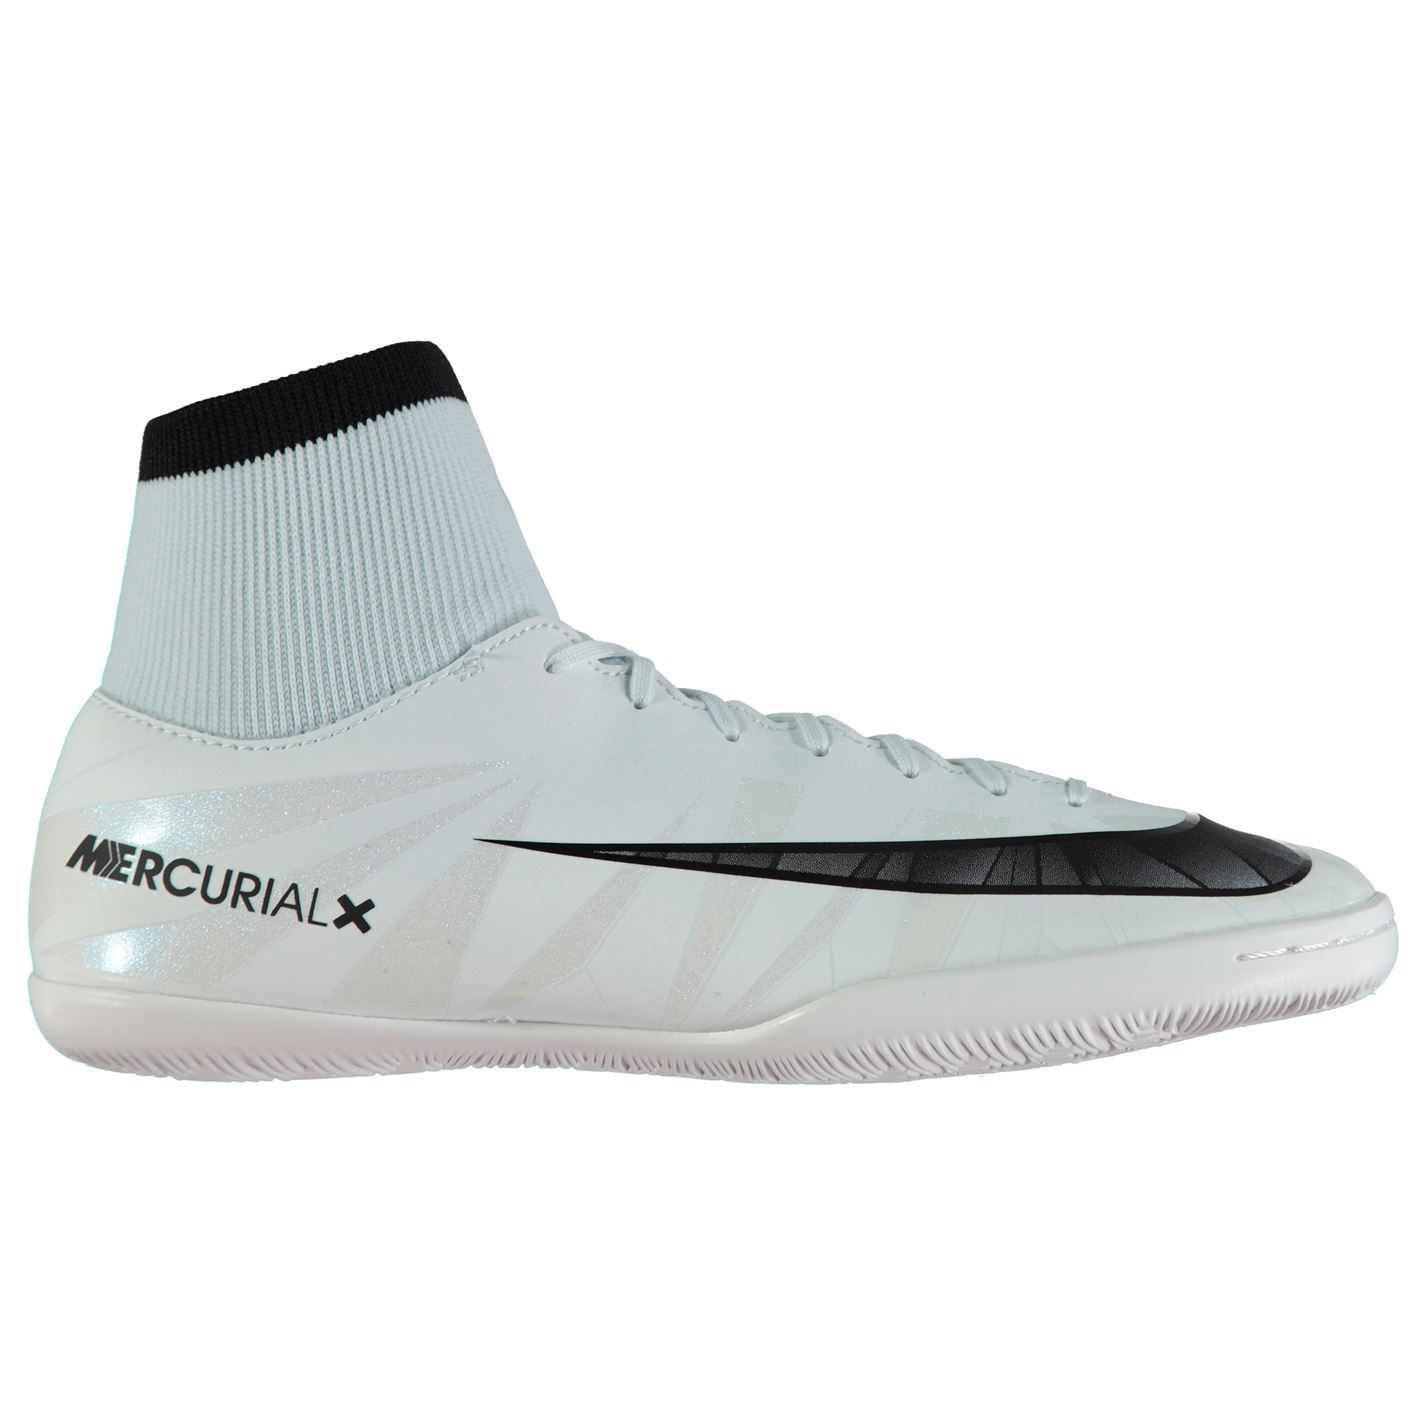 3c41df894de ... Nike MercurialX Victory CR7 DF Indoor Football Trainers Mens Blue  Soccer Shoes ...